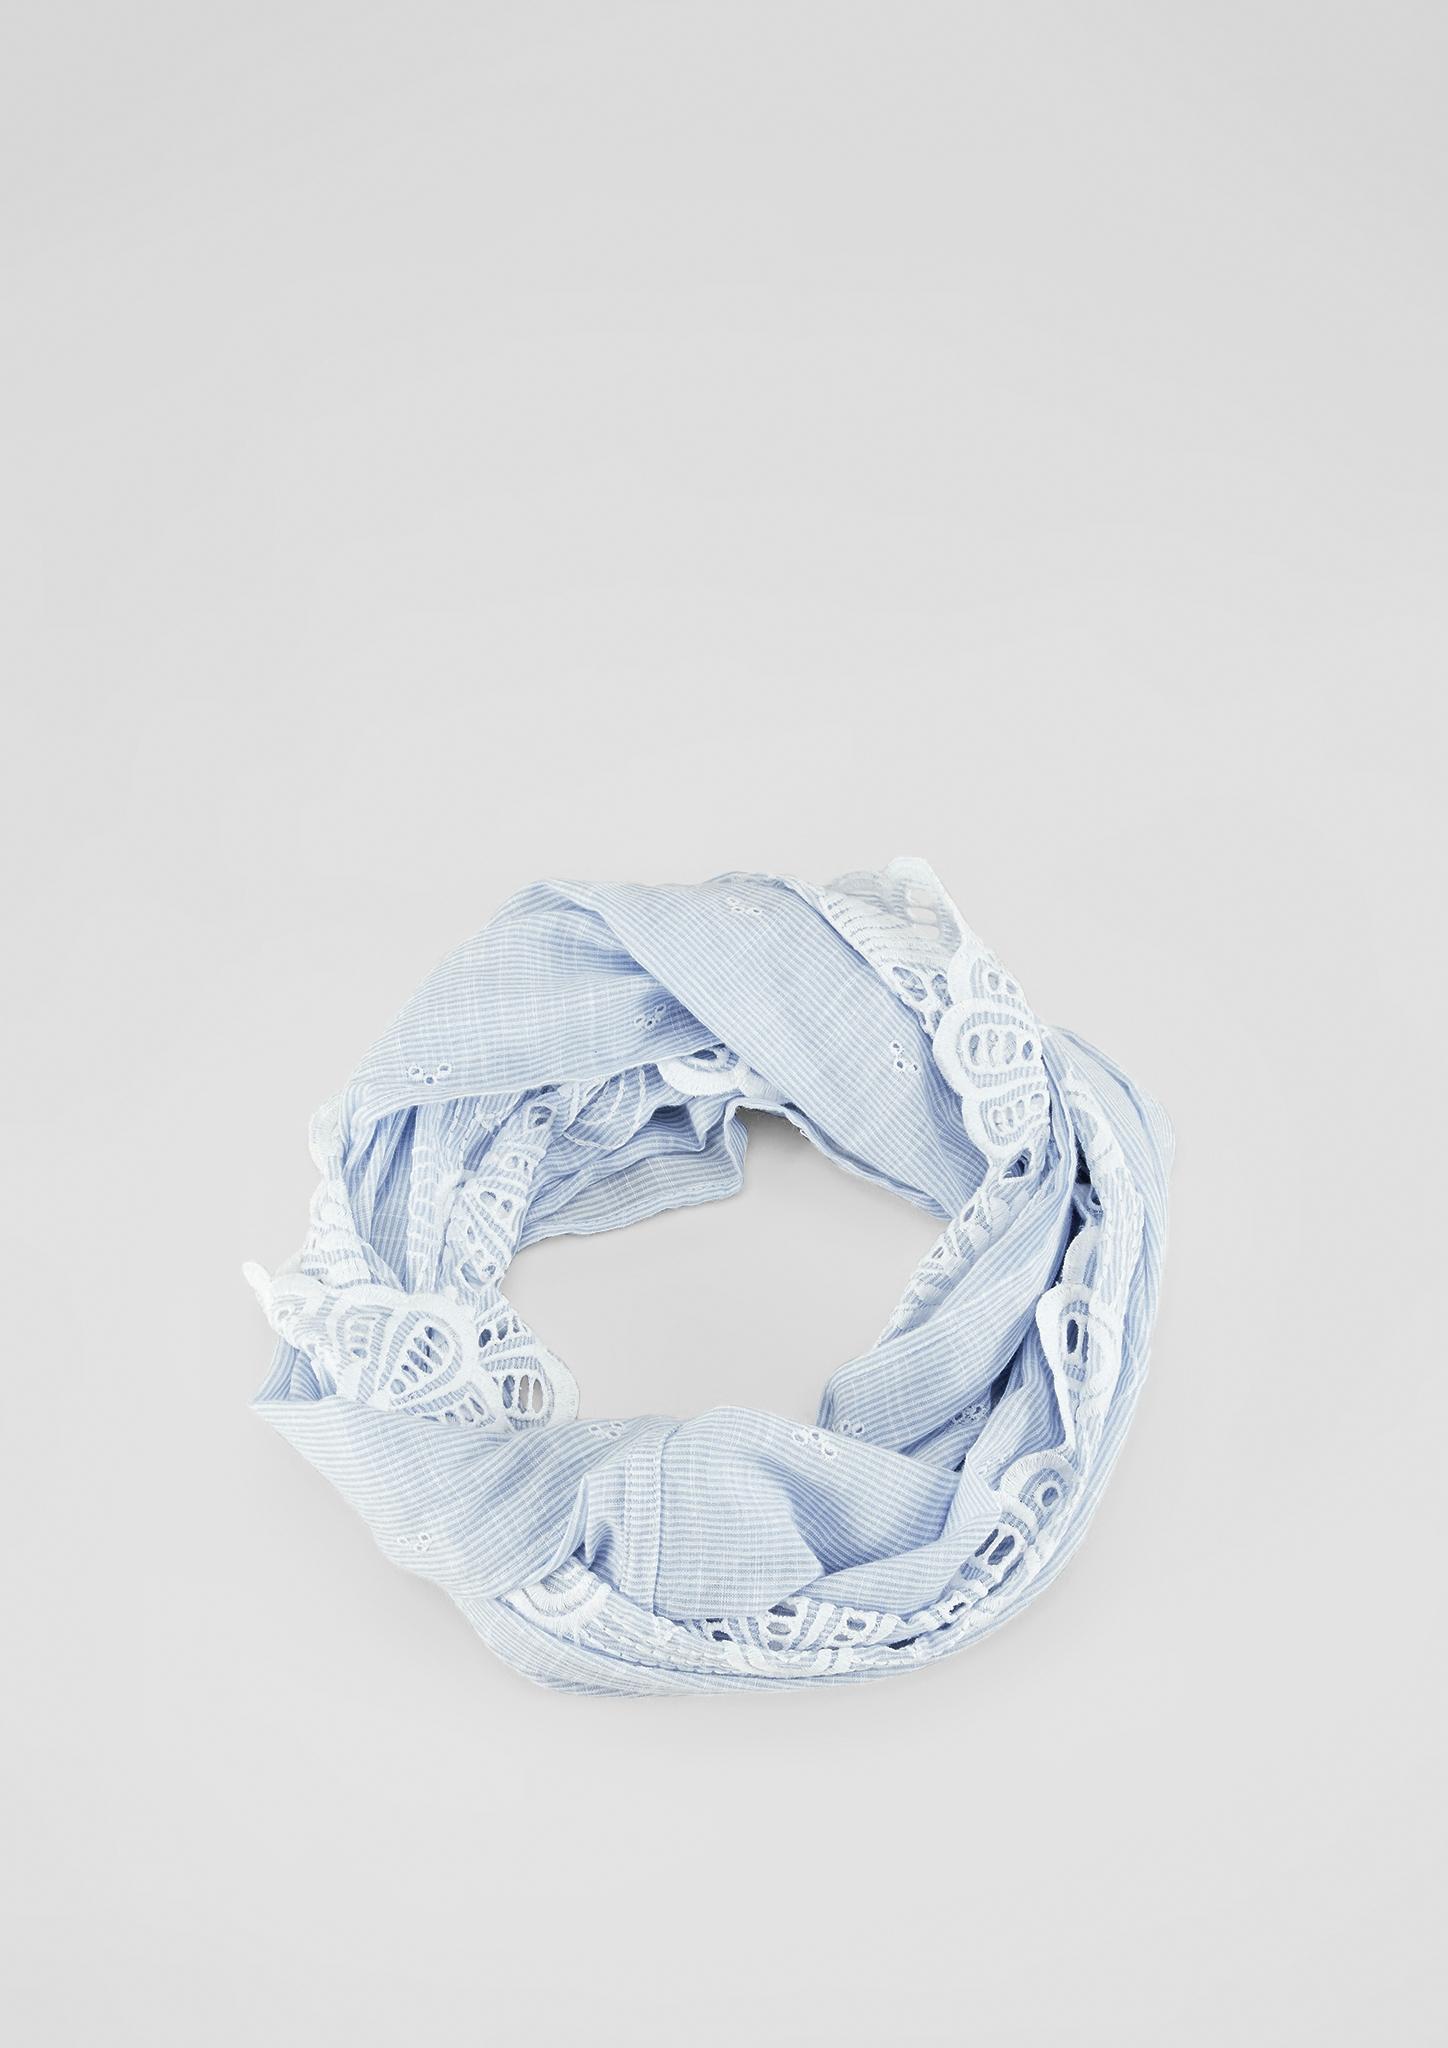 Embroidery-Loop   Accessoires > Schals & Tücher > Loops   Blau   100% baumwolle   s.Oliver